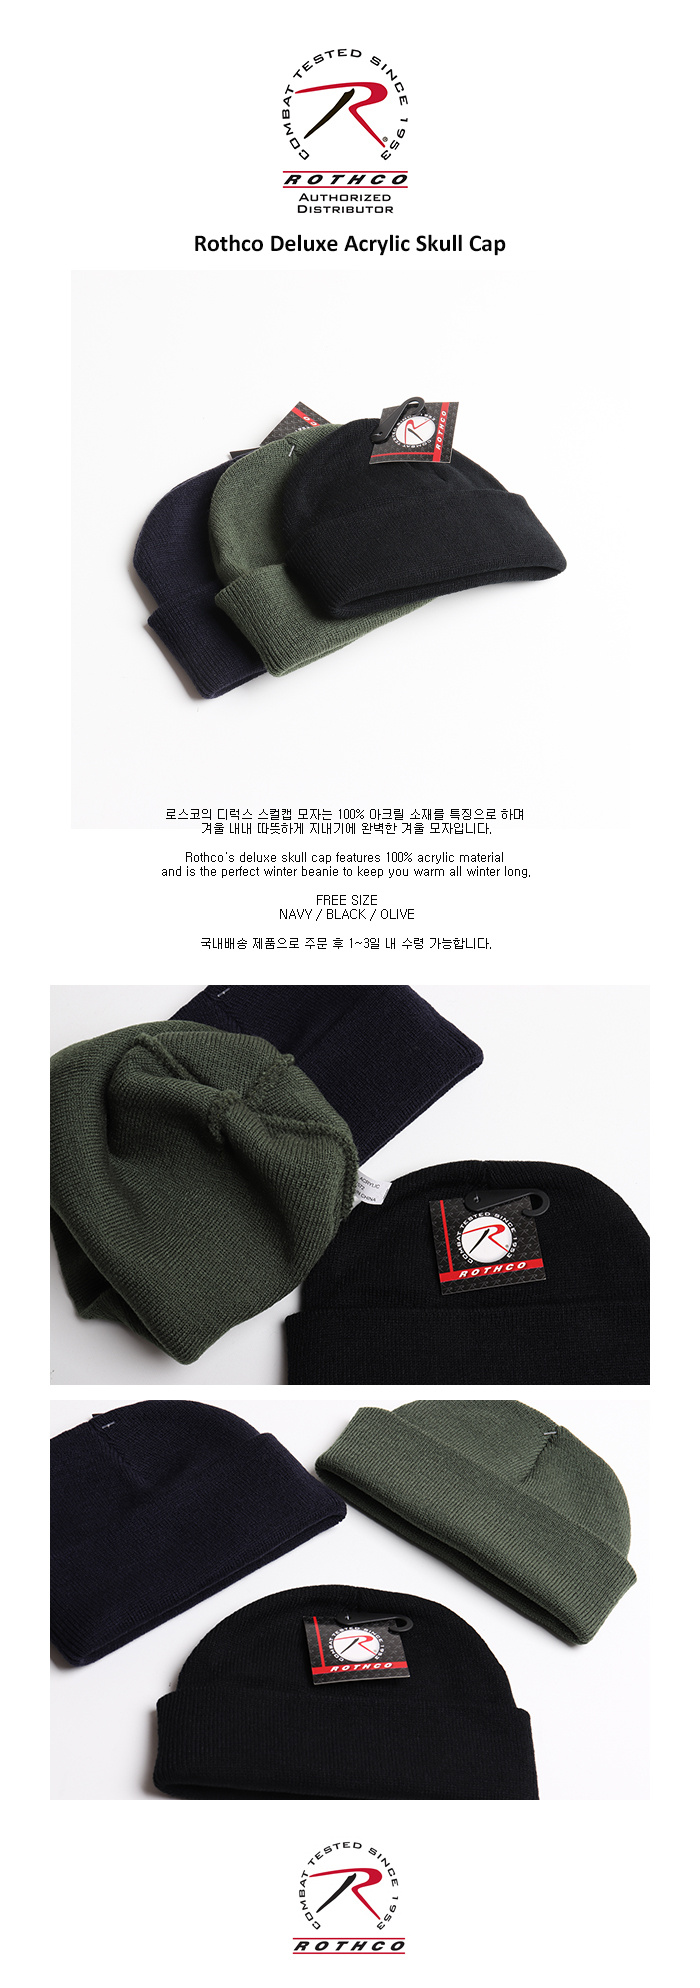 DELUXE ACRYLIC SKULL CAP